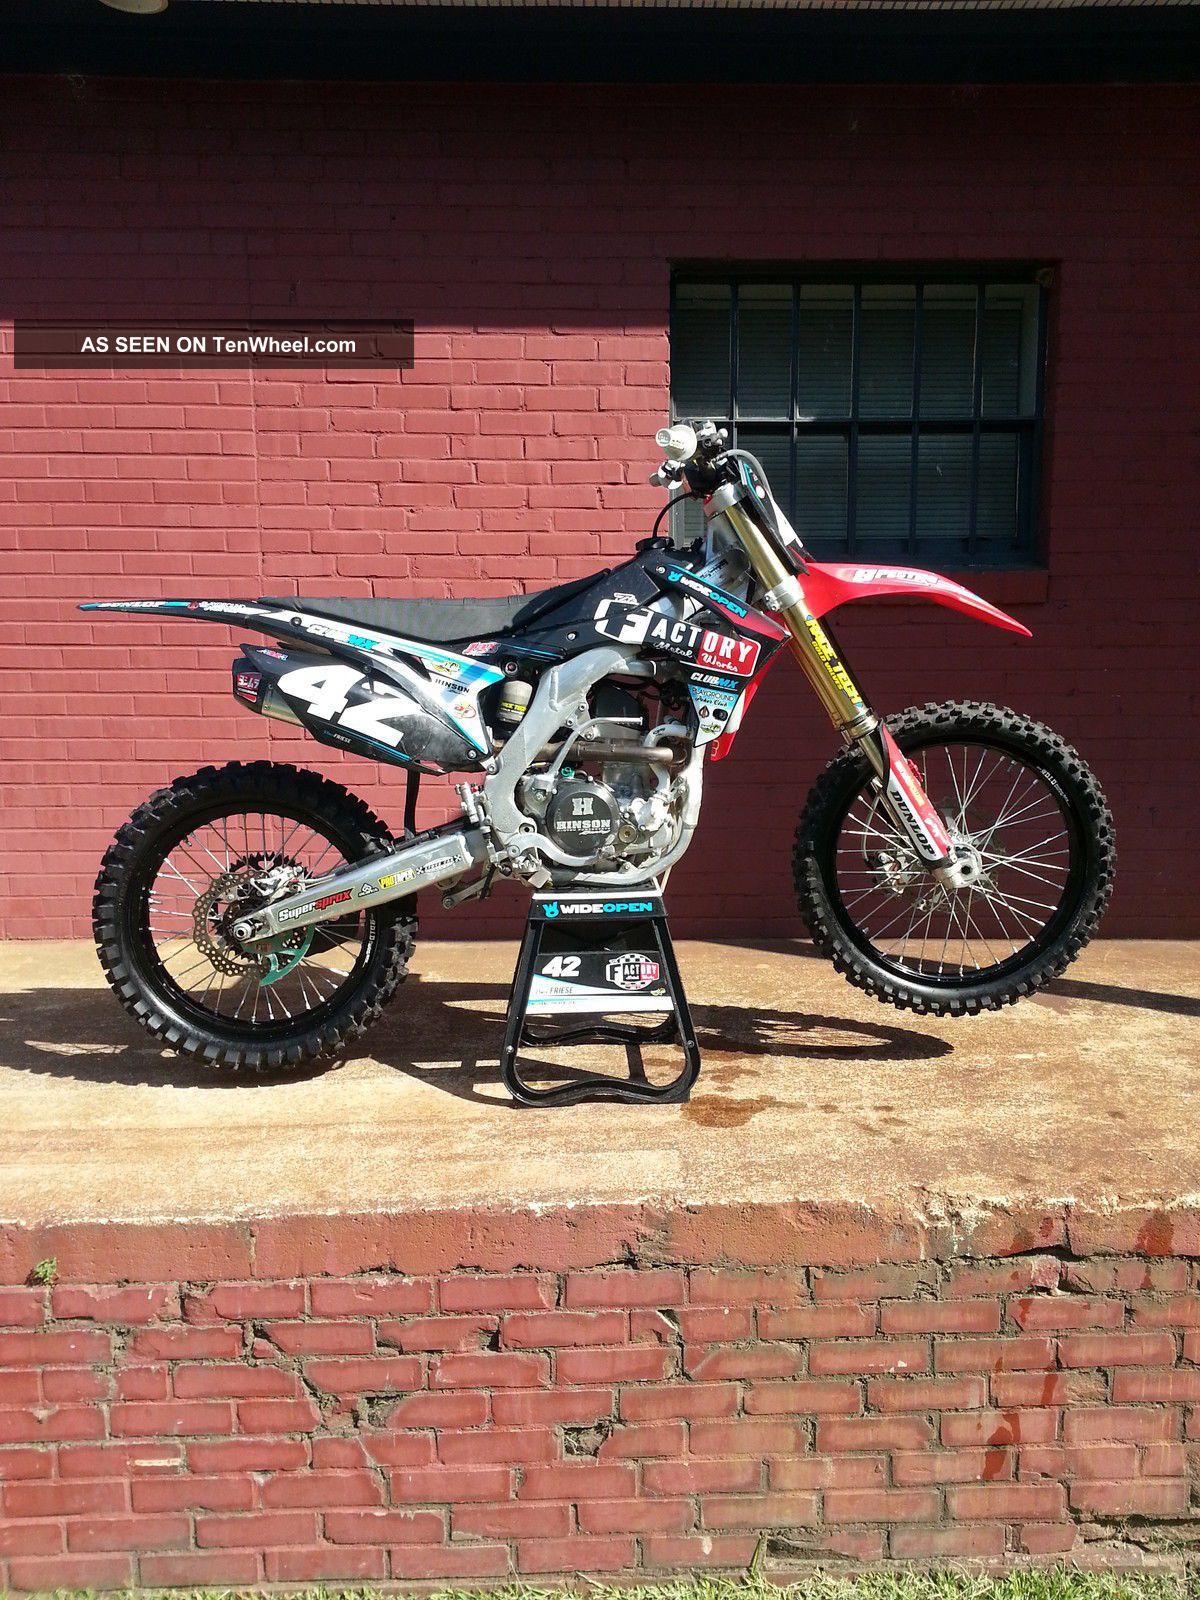 2014 Crf 250 Works Factory Like Dirt Bike Moto Mx Sx Supercross Podium Winner CRF photo